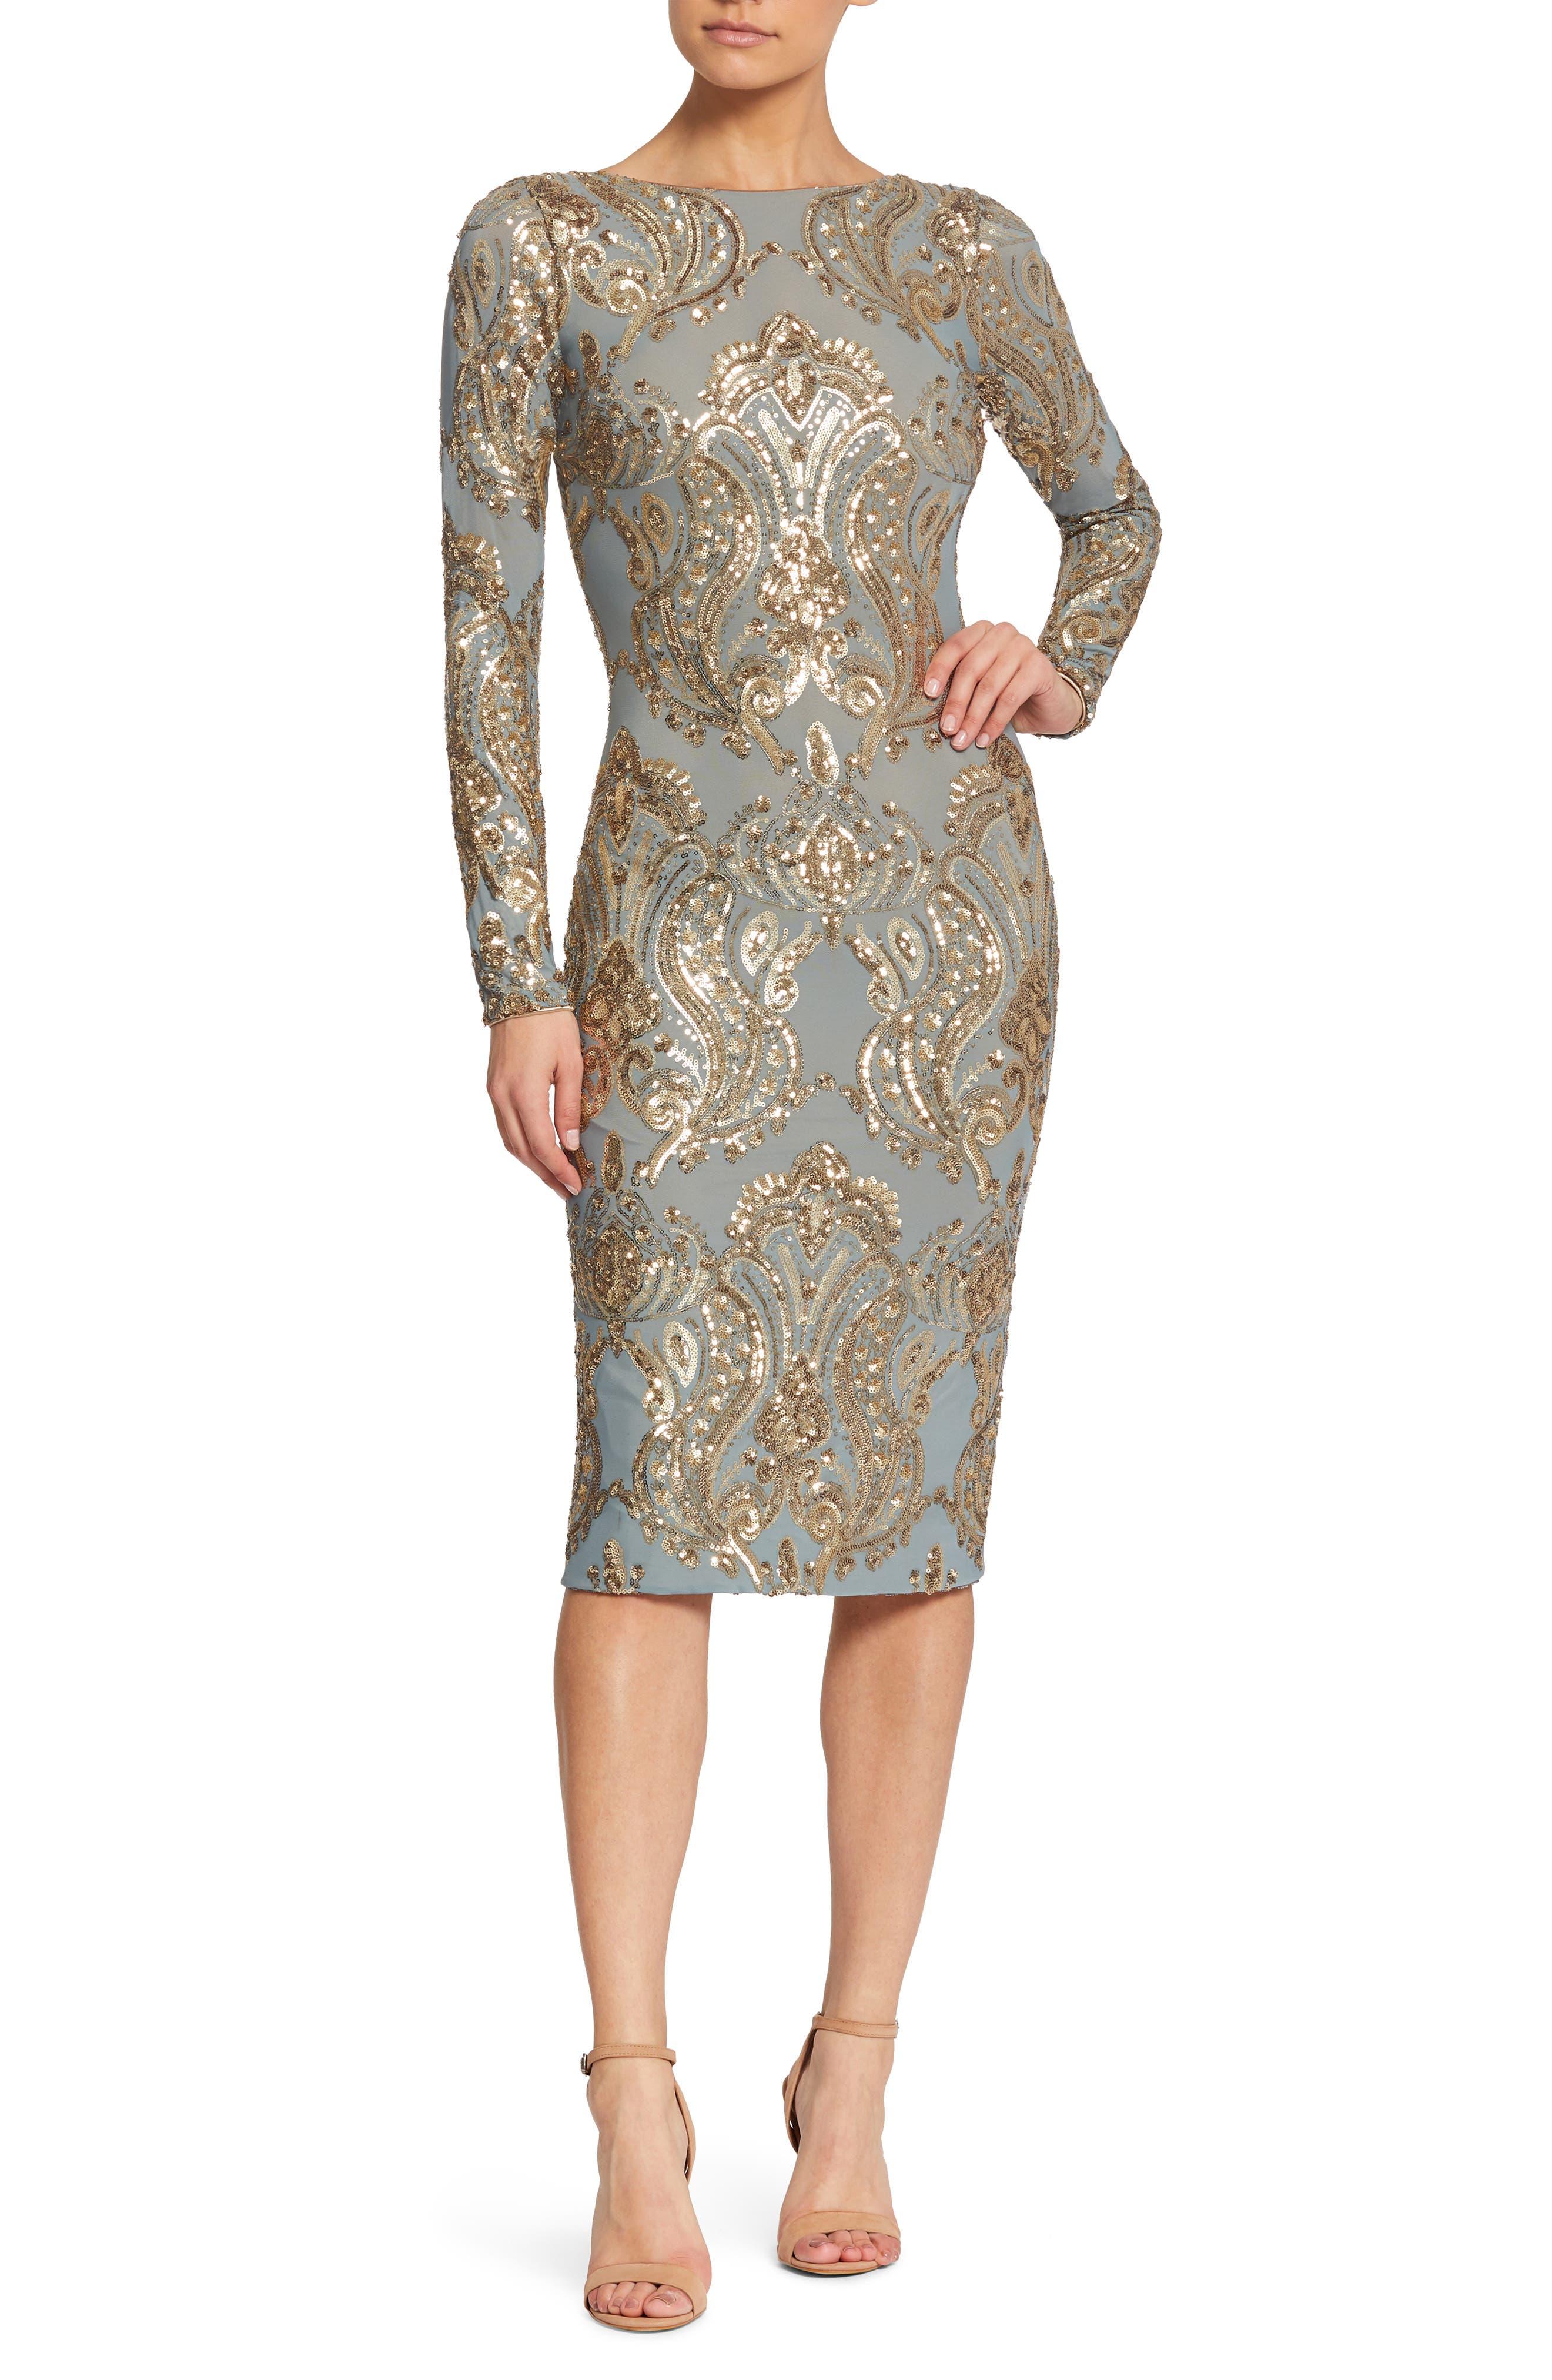 Emery Sequin Sheath Dress,                         Main,                         color, Teal/ Gold